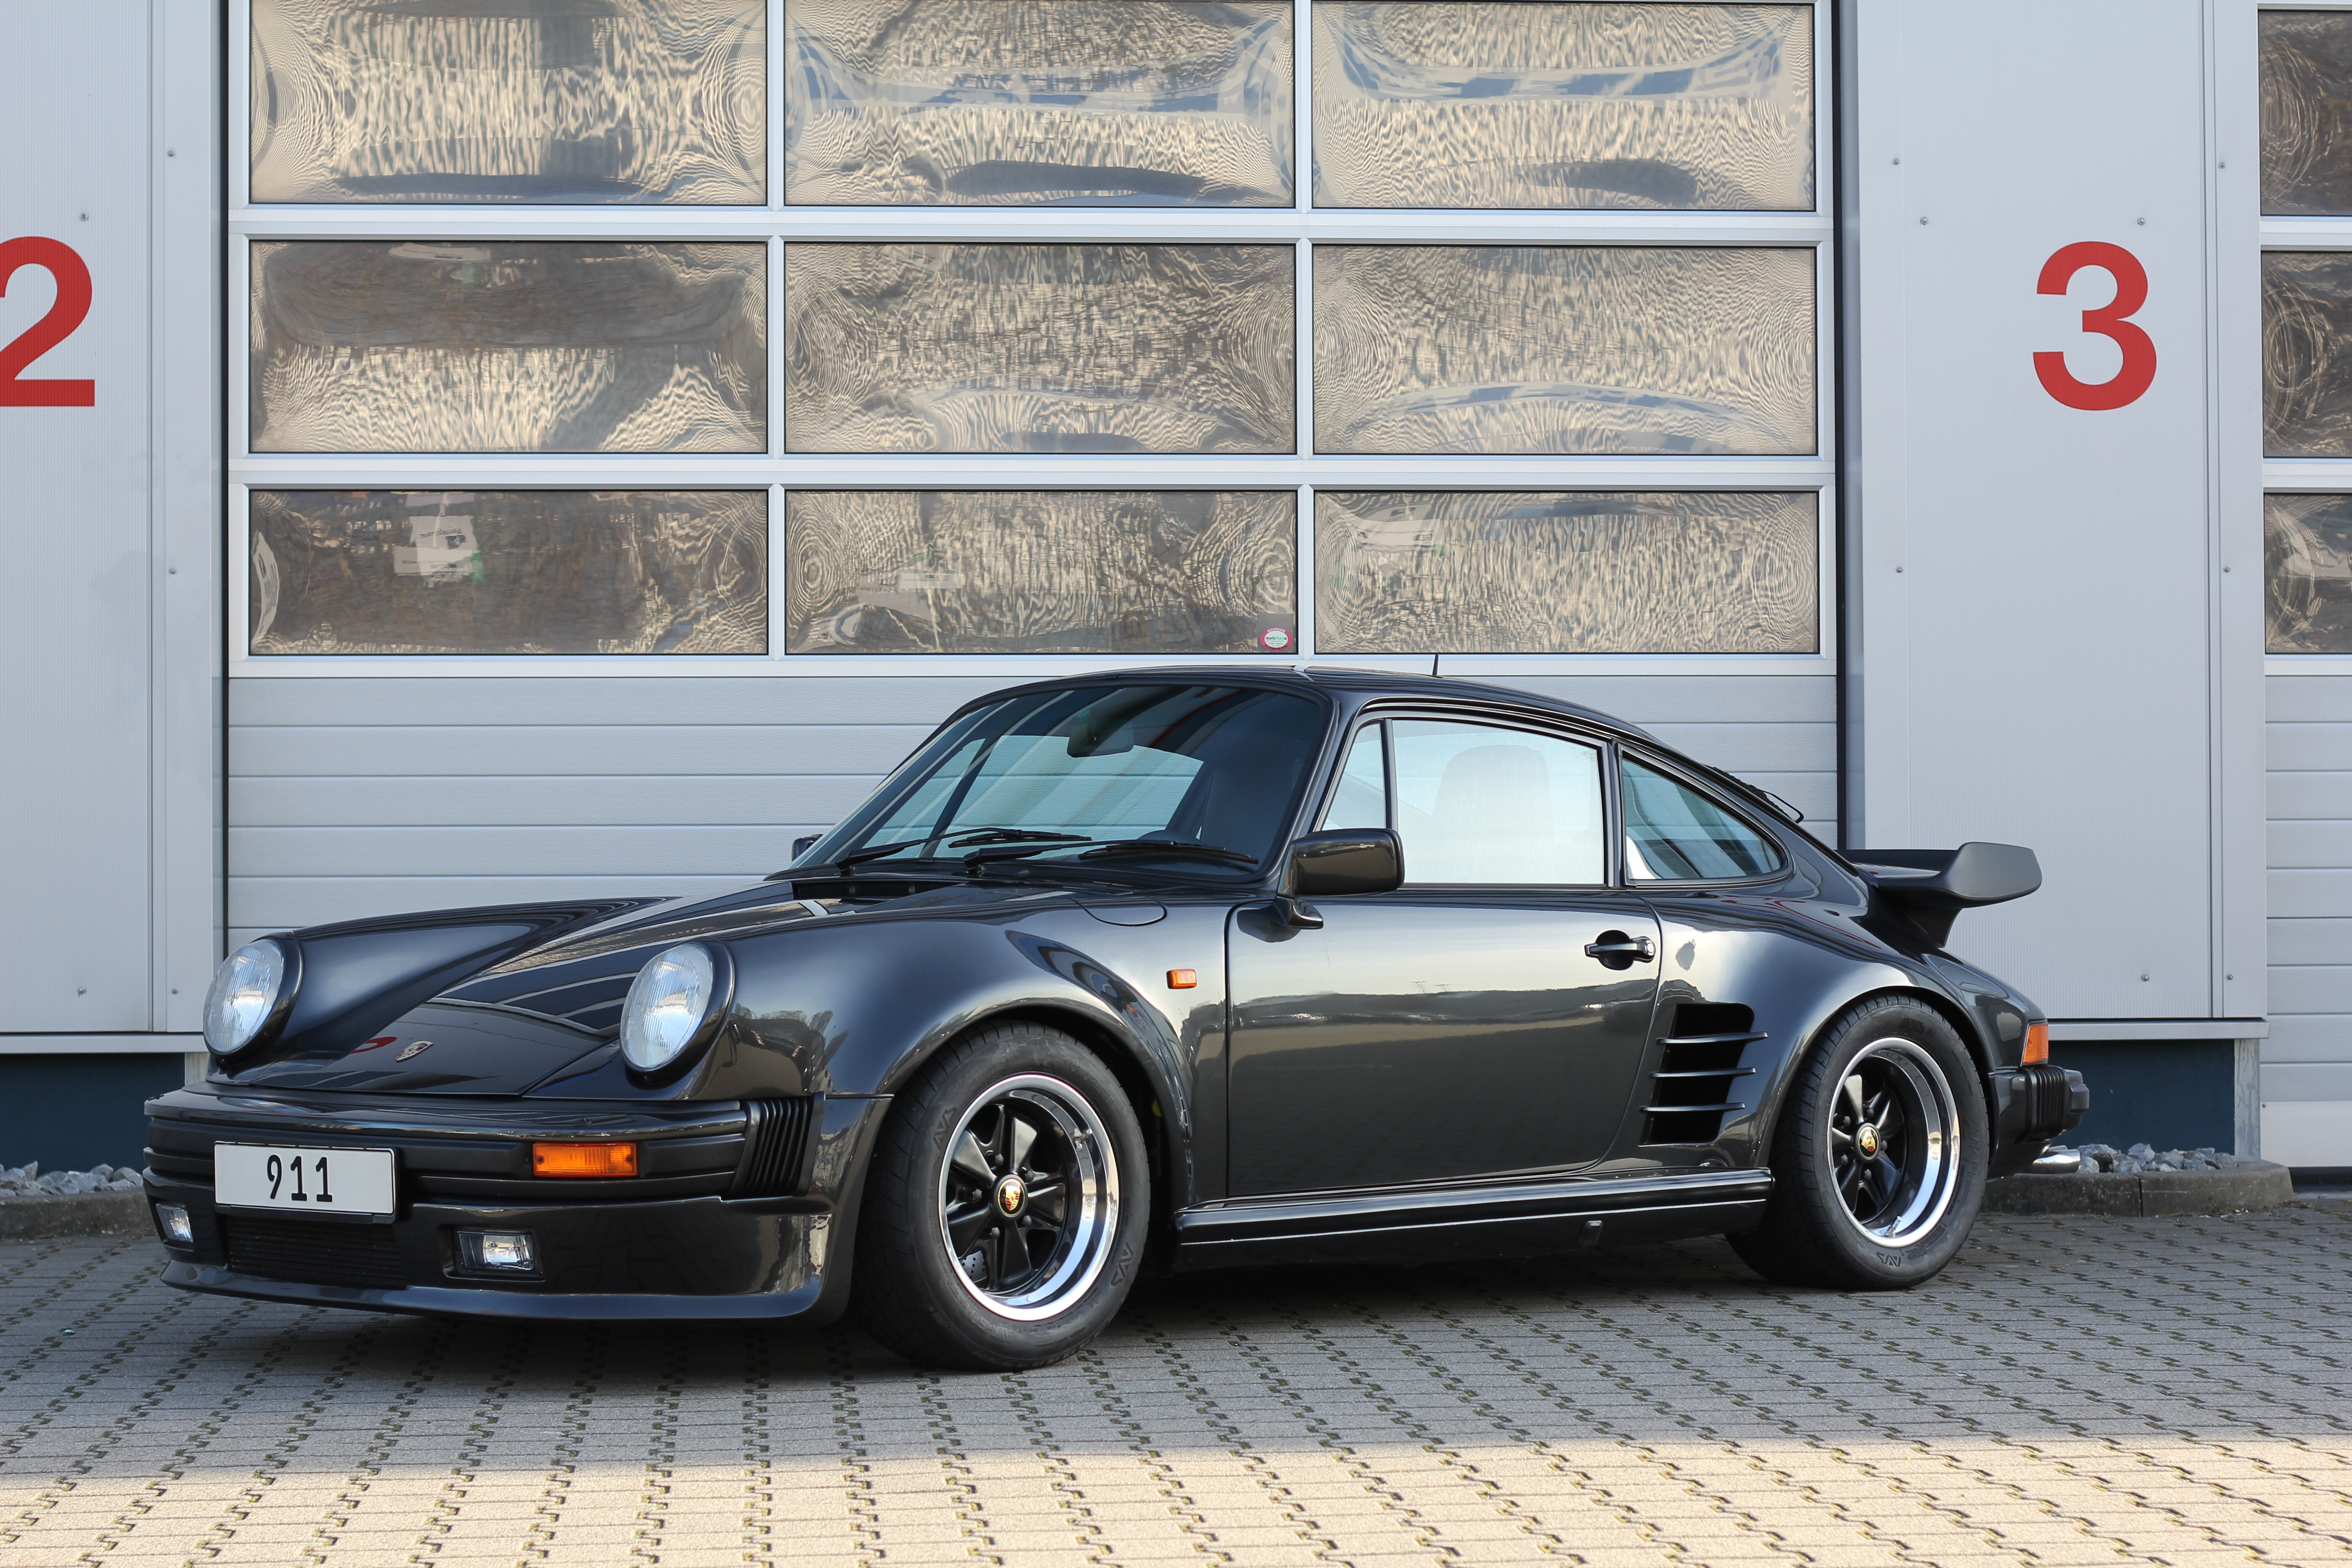 1984 Porsche 911 Turbo 911 930 Turbo Wls 3 3l Exclusive Classic Driver Market